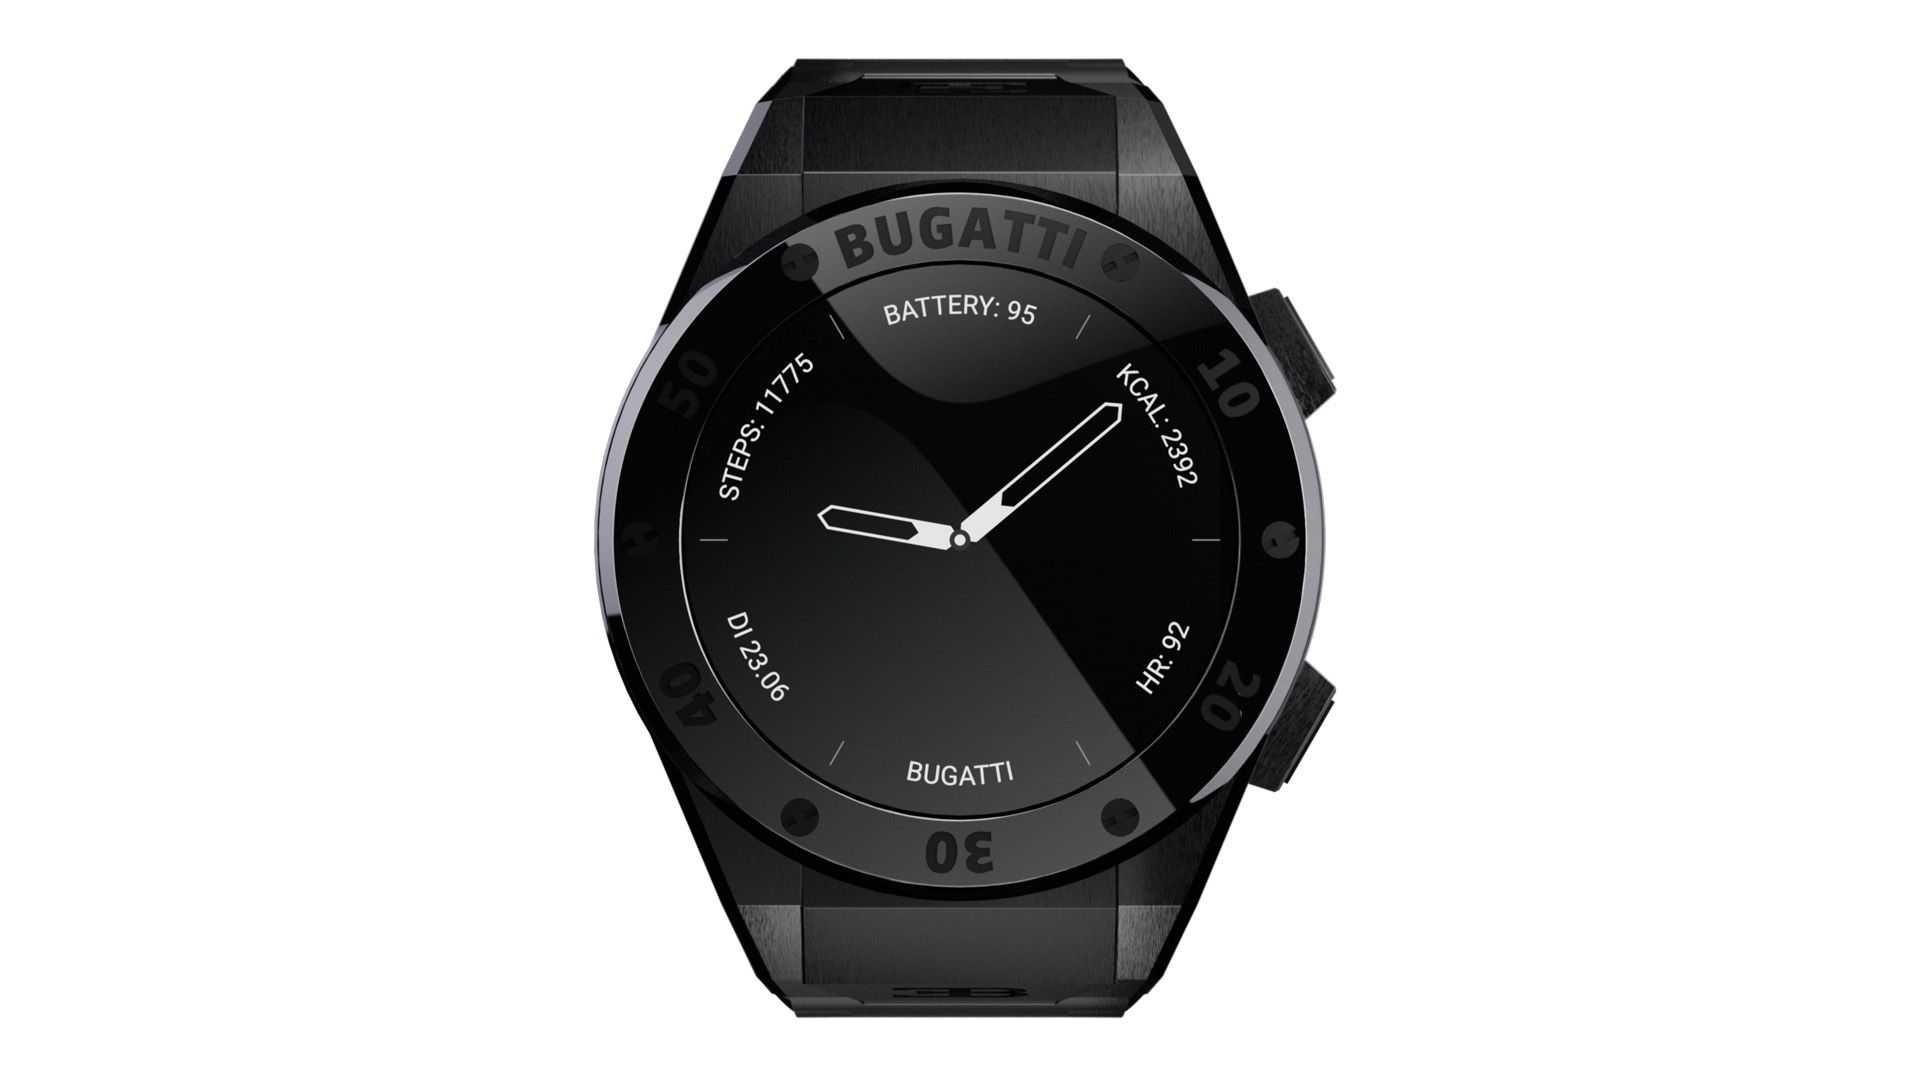 Bugatti_Smartwatch-0001